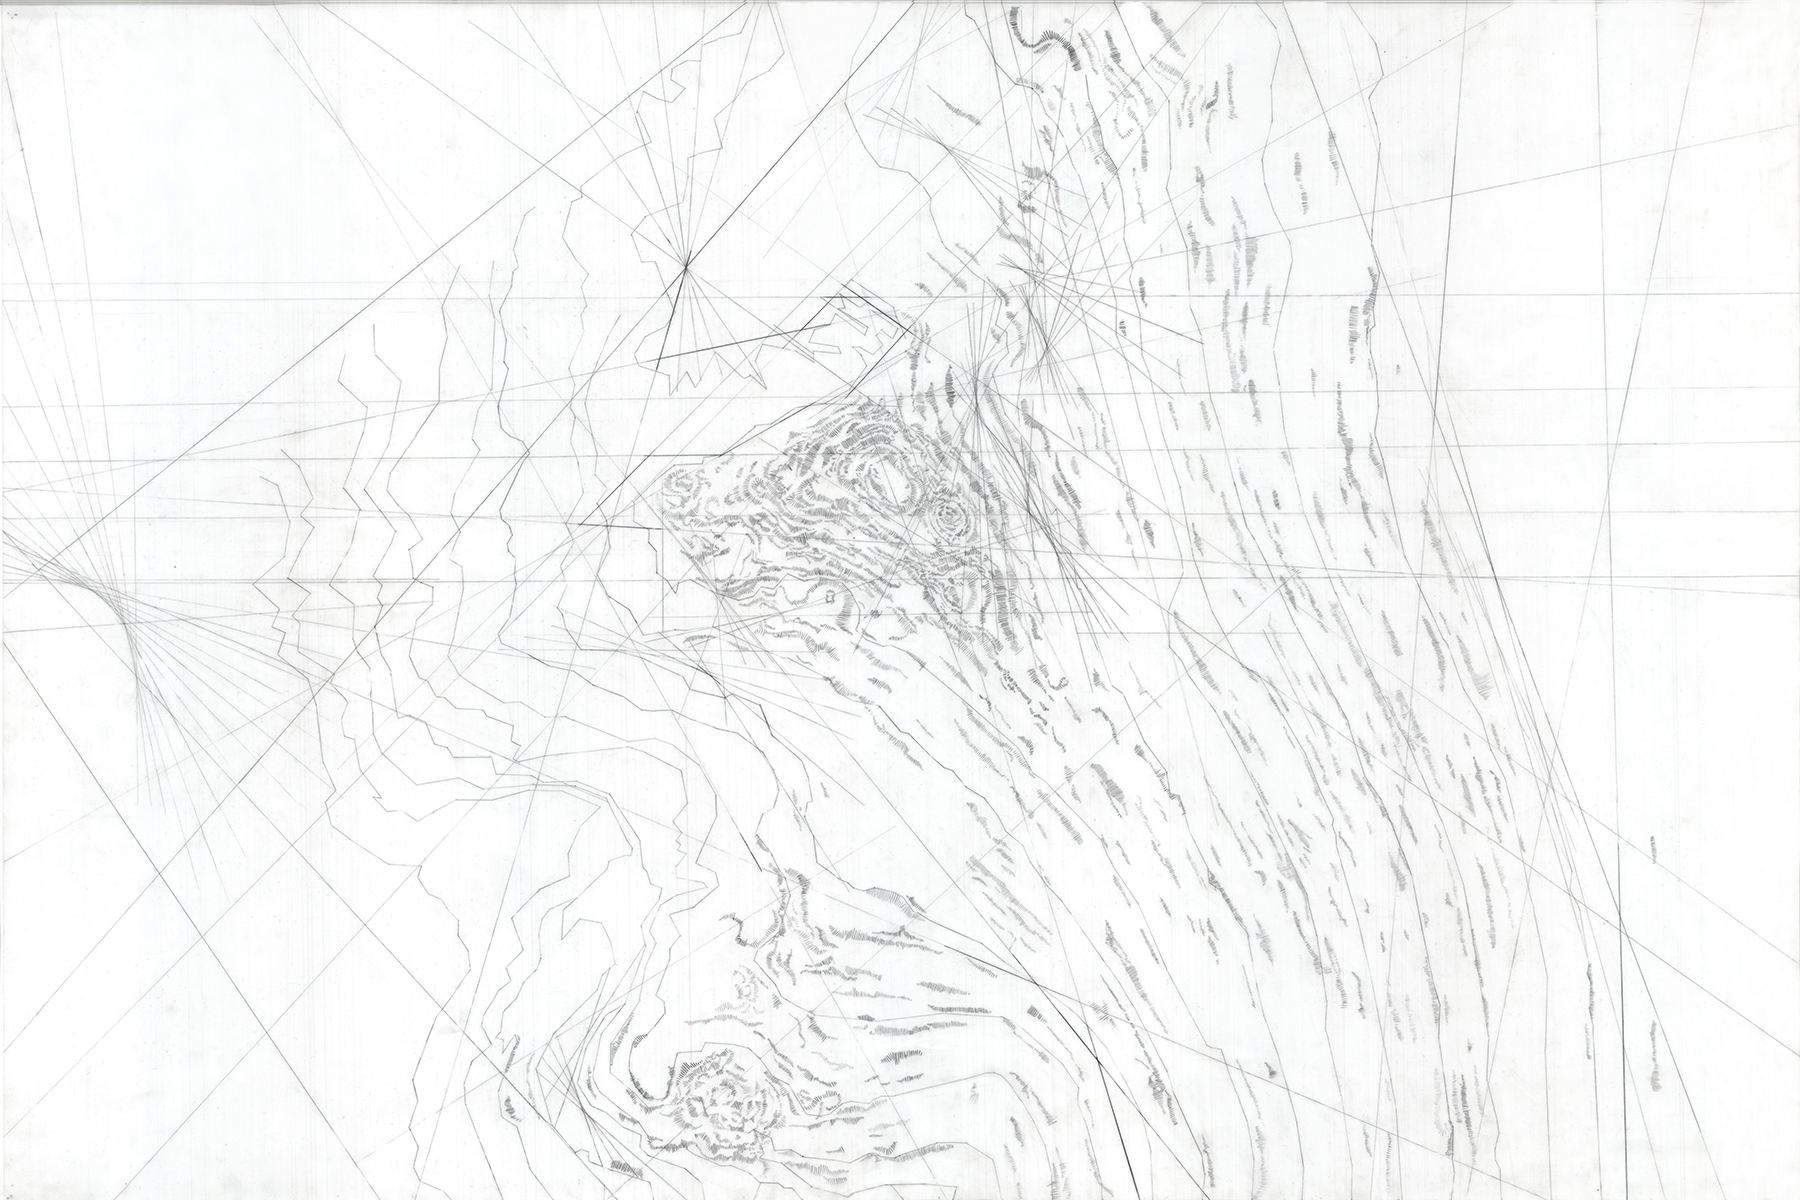 Fujimoto_pattern-drawing.jpg